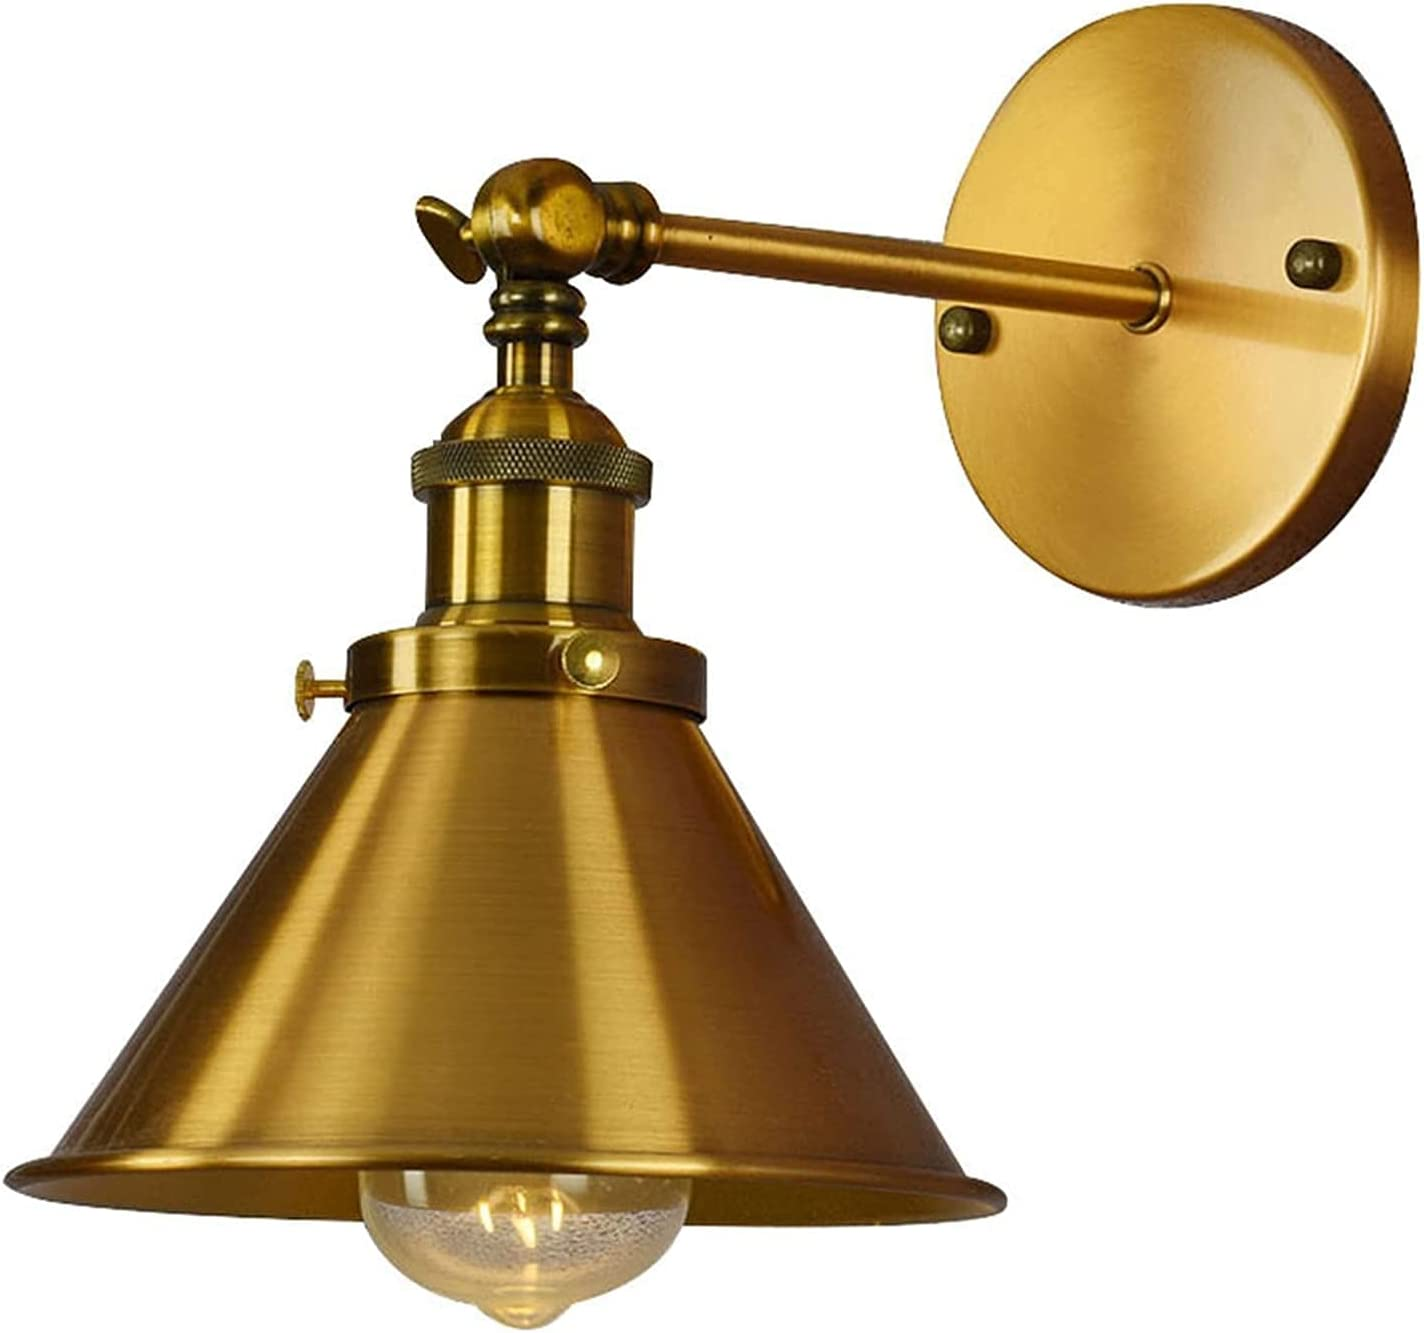 BINHC Wall Lamp Vintage Industrial Rustic Nippon regular agency Ranking TOP17 Lighting Loft Retro Wa